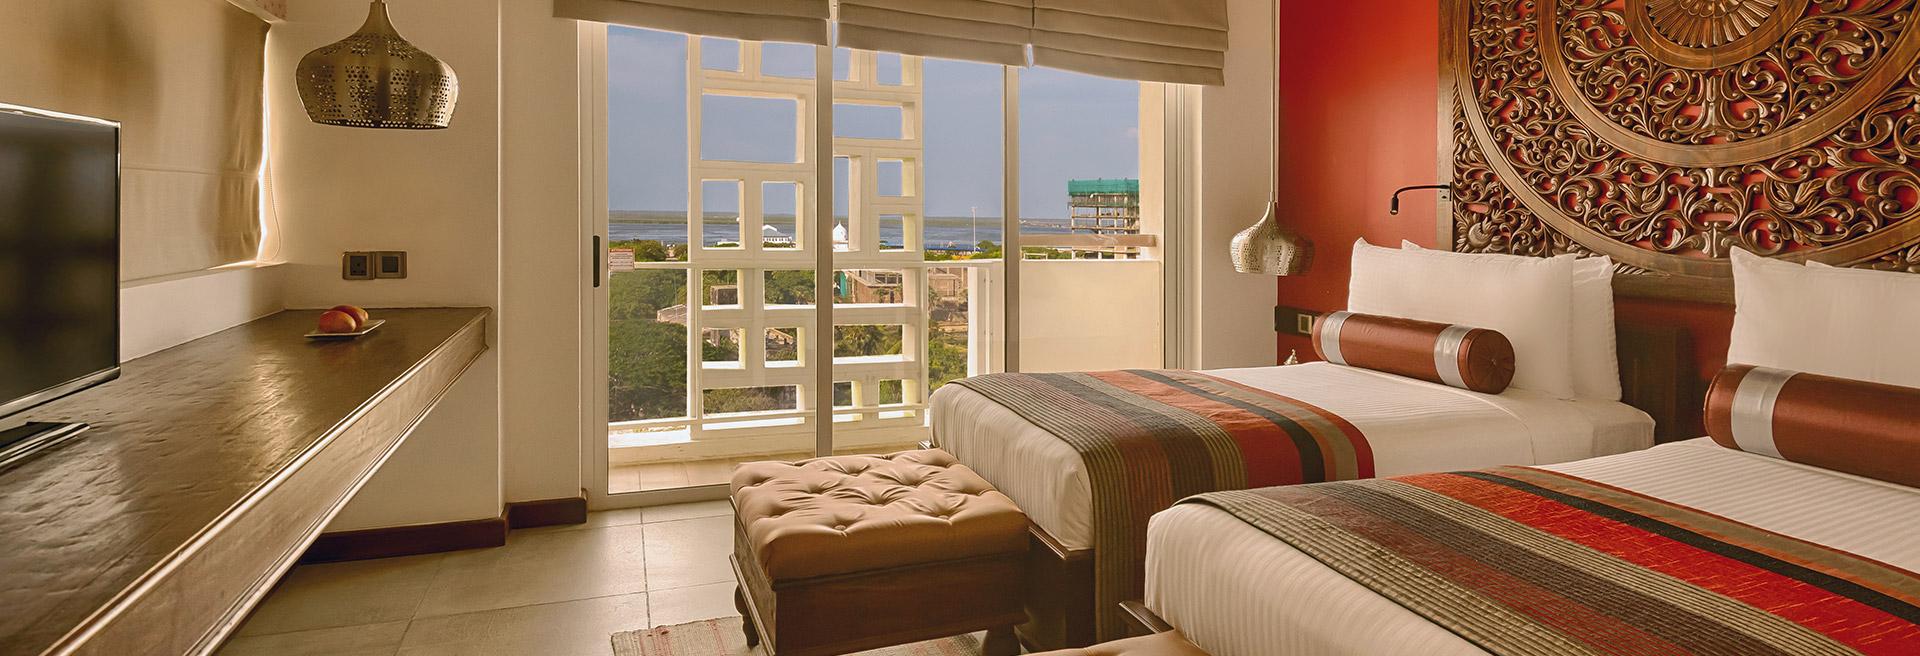 Jetwing Jaffna Hotel Luxury Accomodation